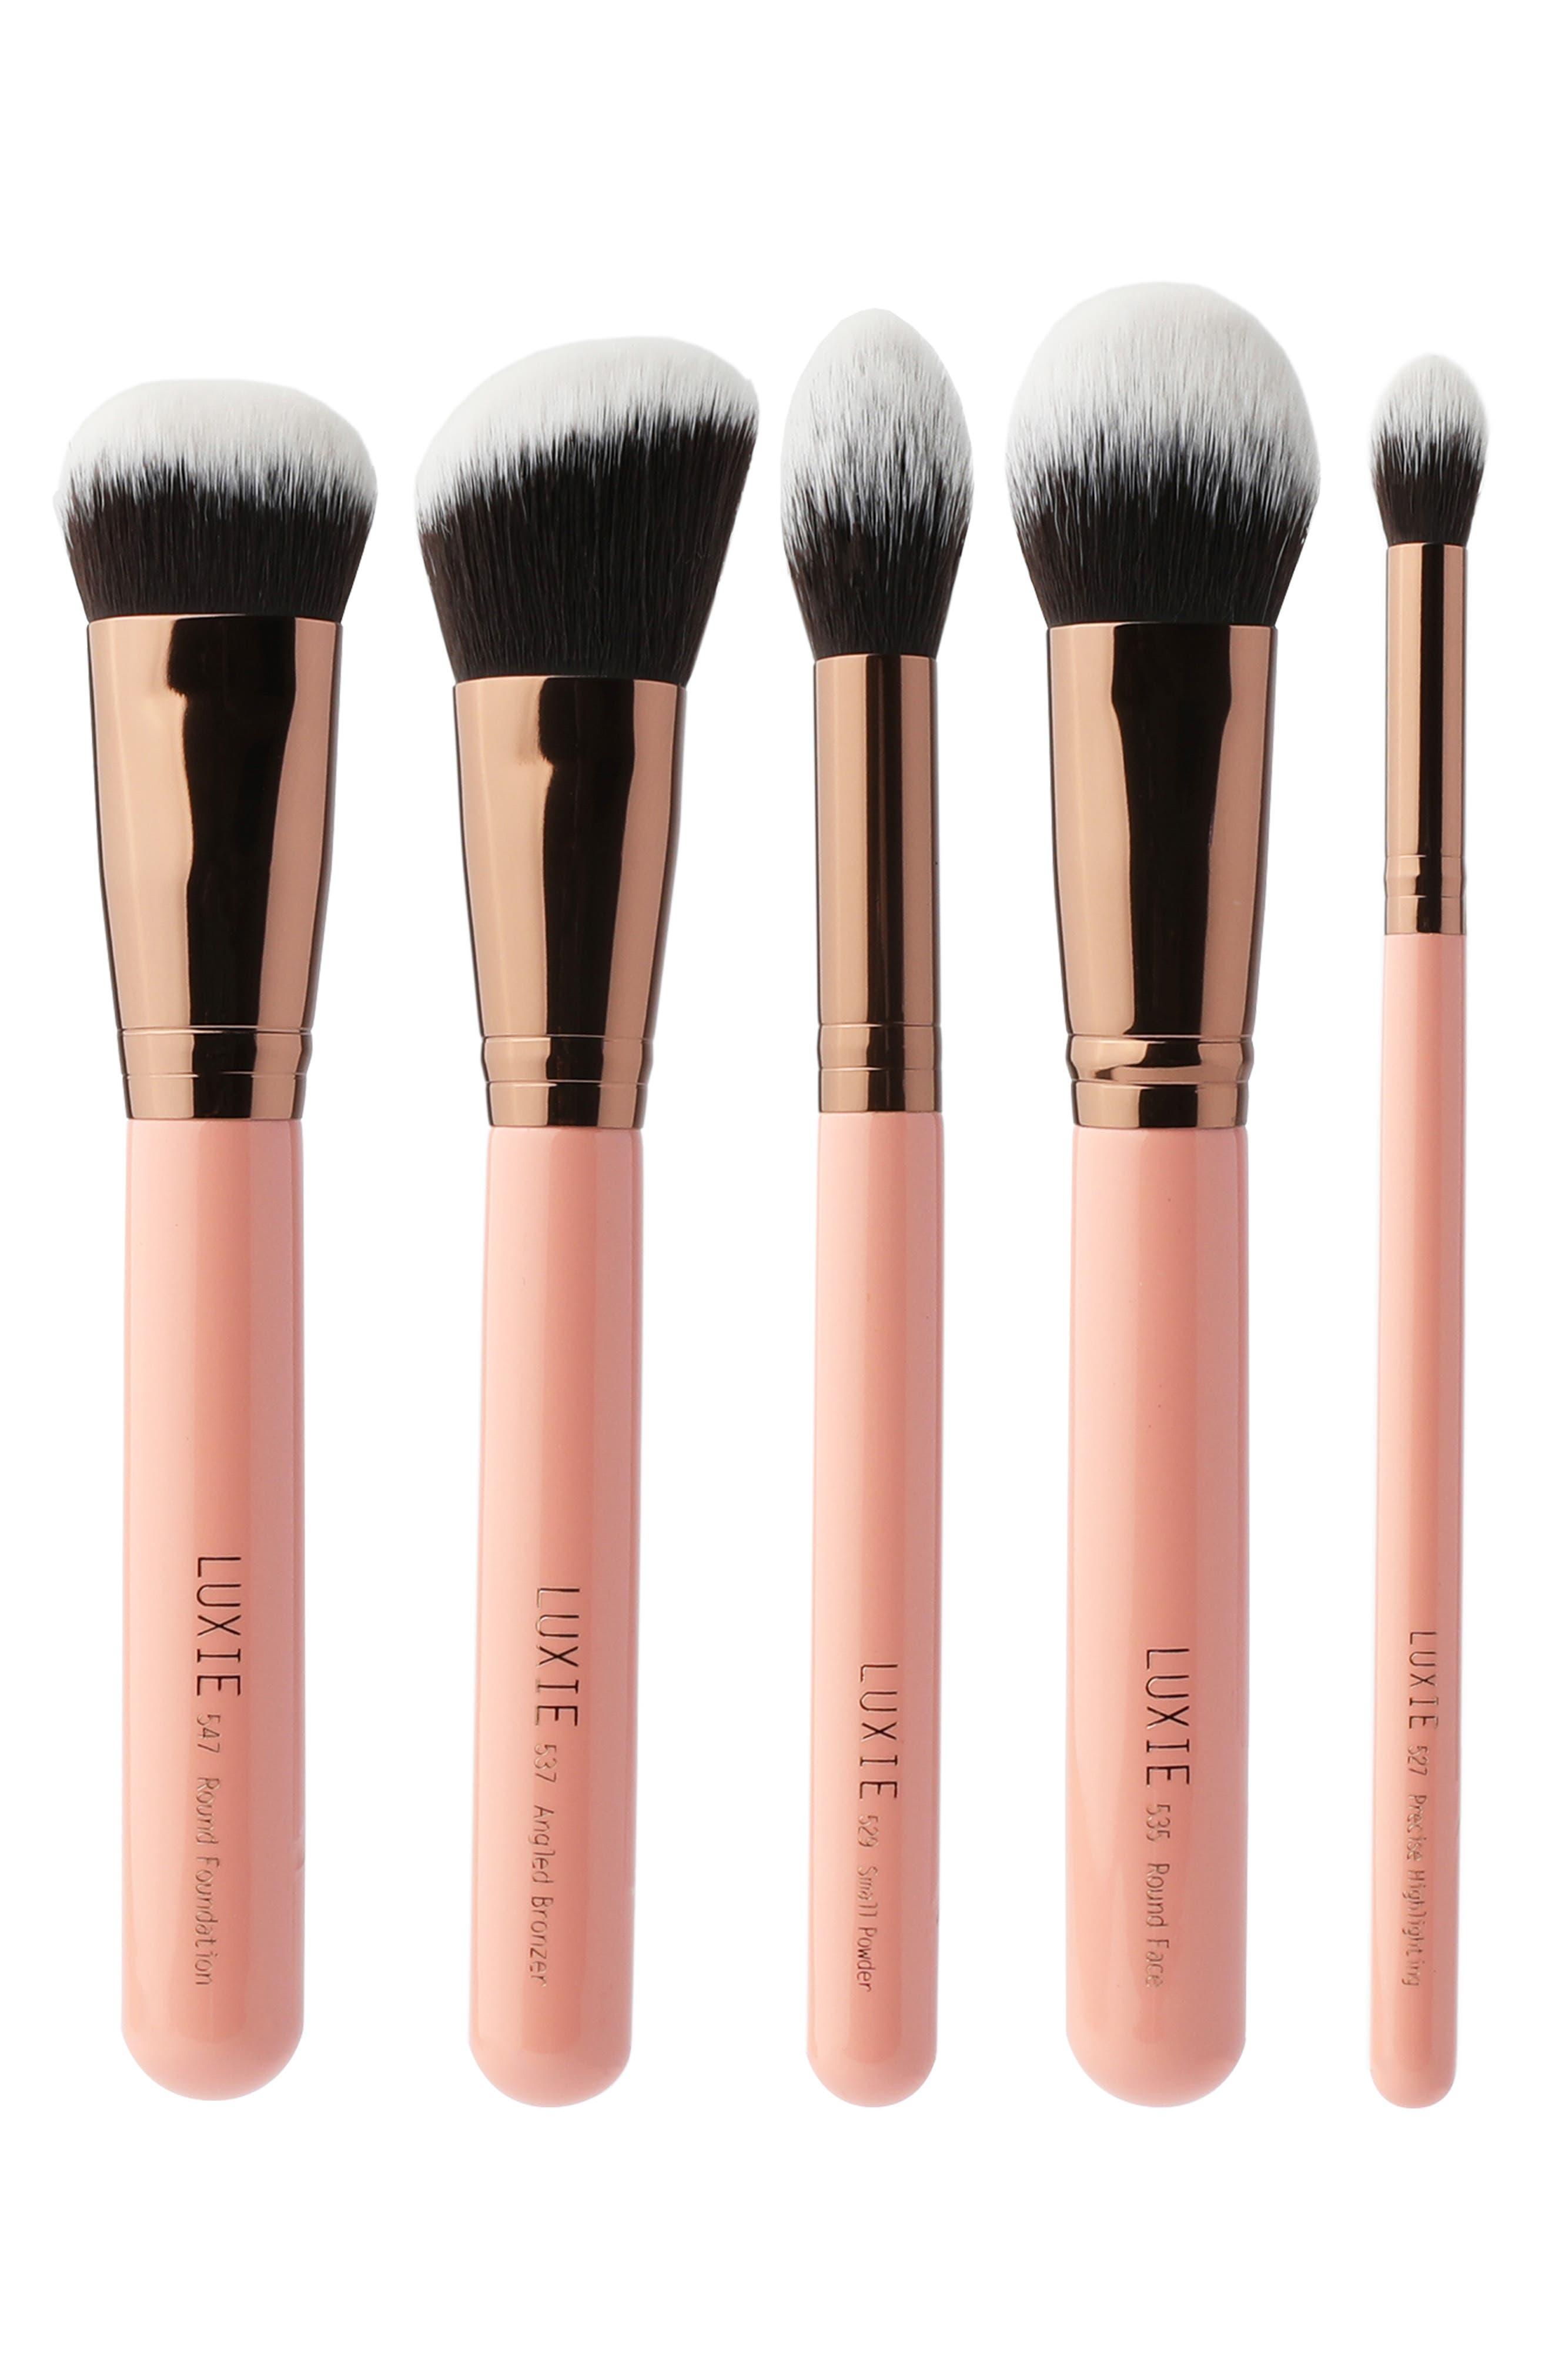 Rose Gold Pro Complexion Brush Set-$116 Value